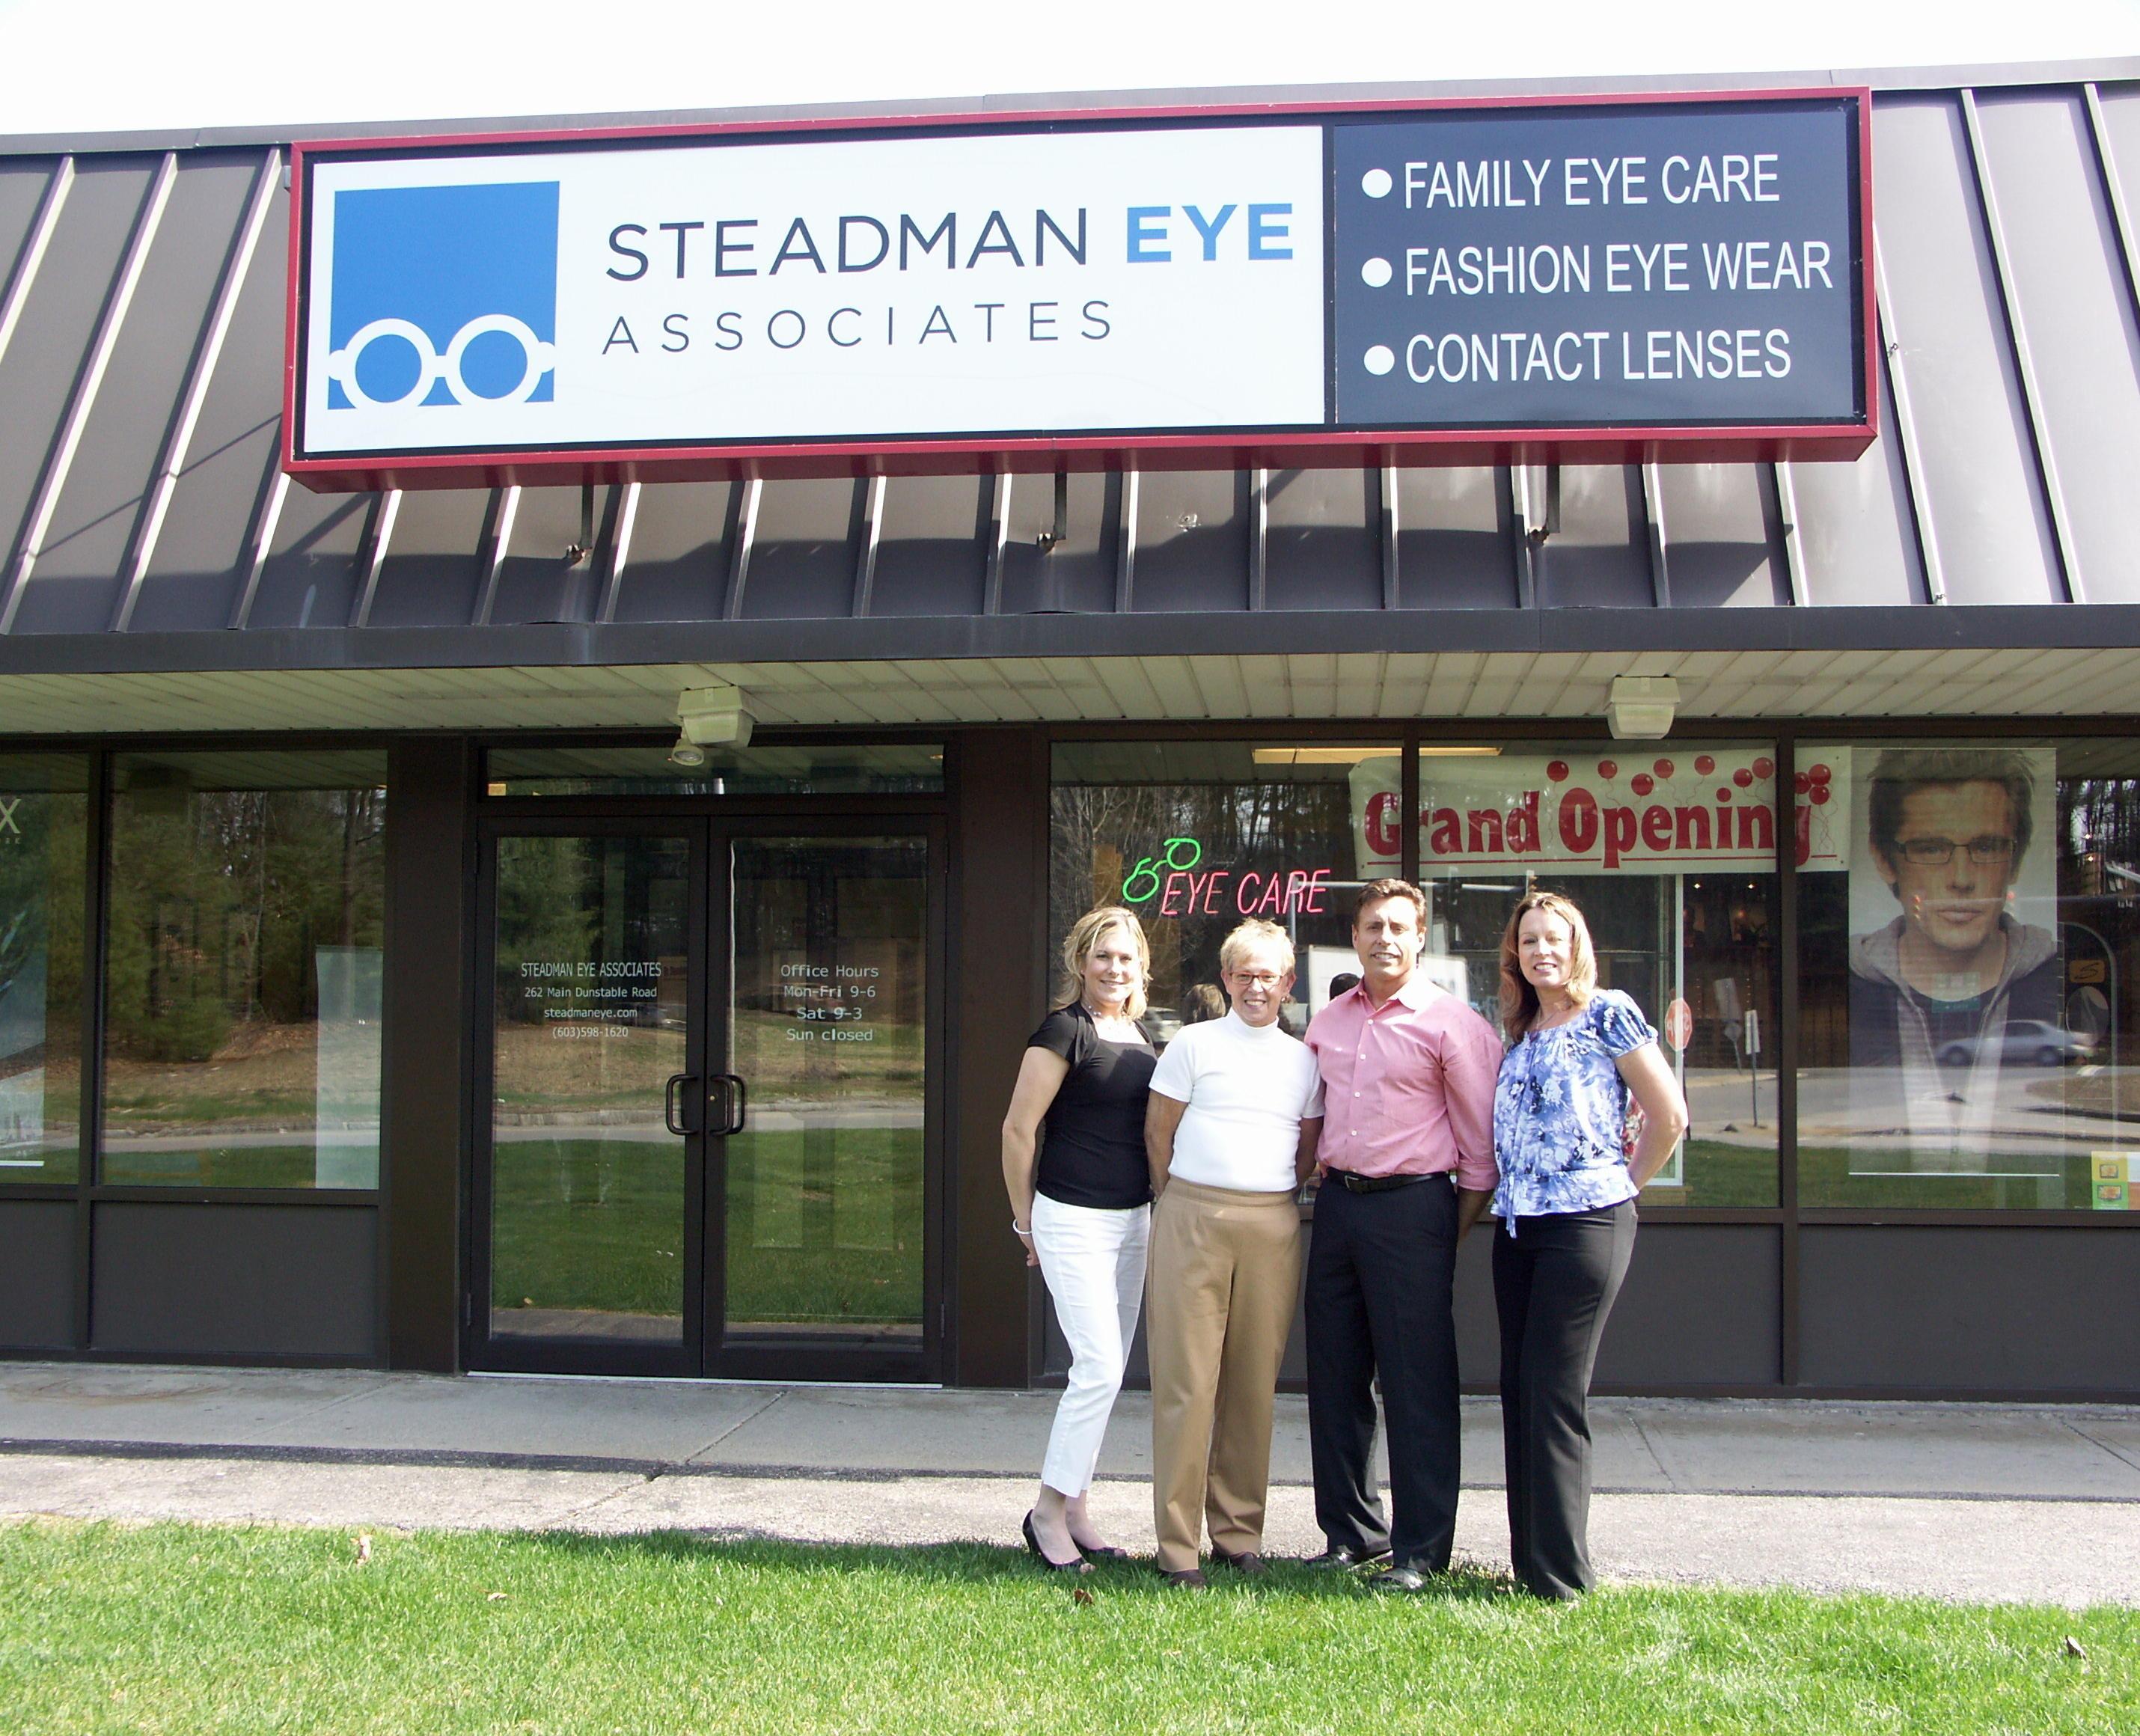 Steadman Eye Associates